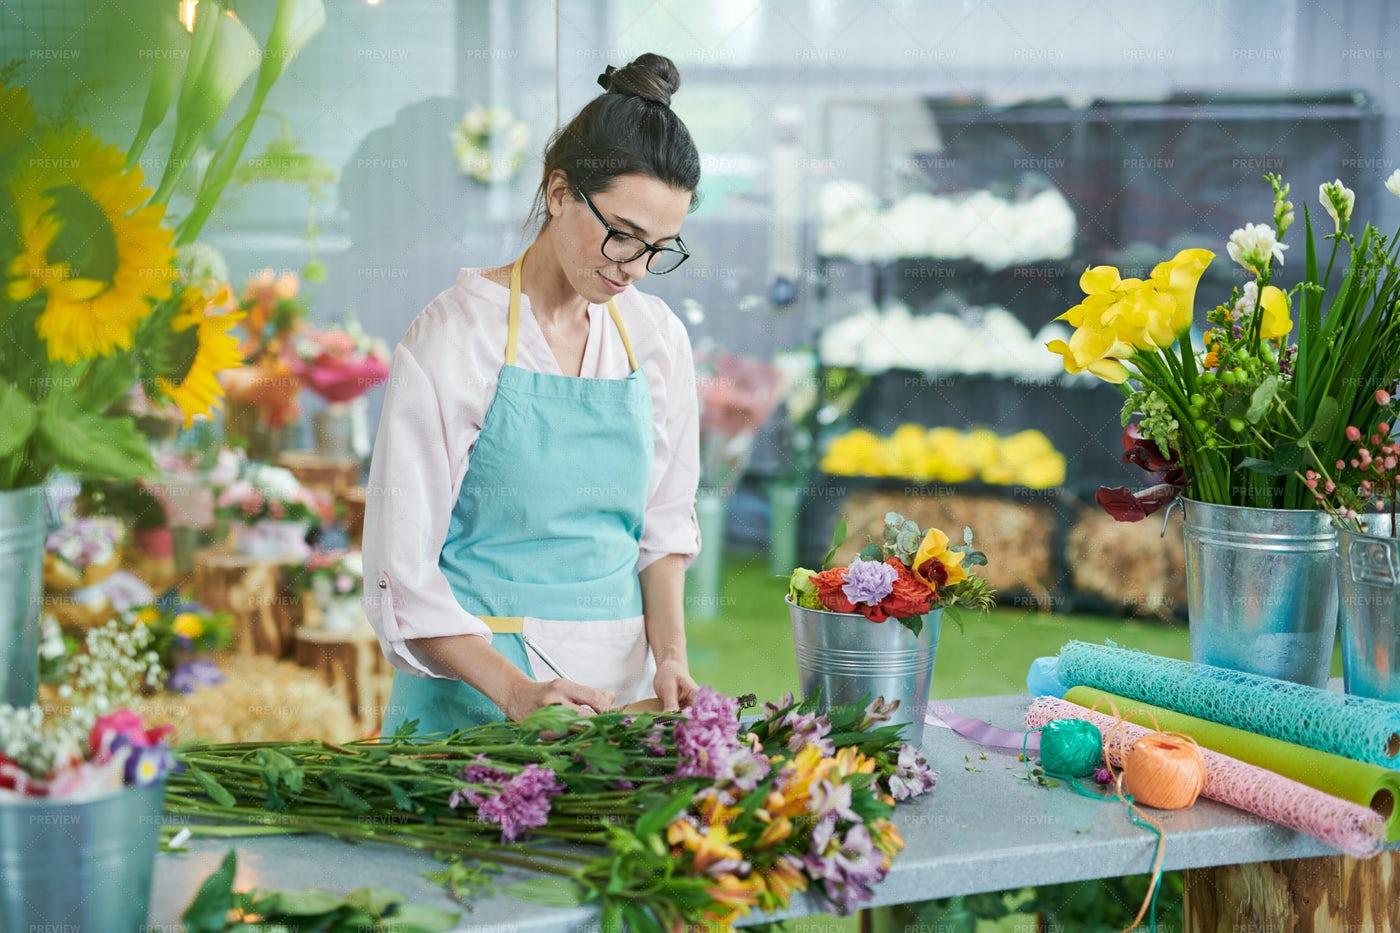 Young Woman Arranging Flowers: Stock Photos